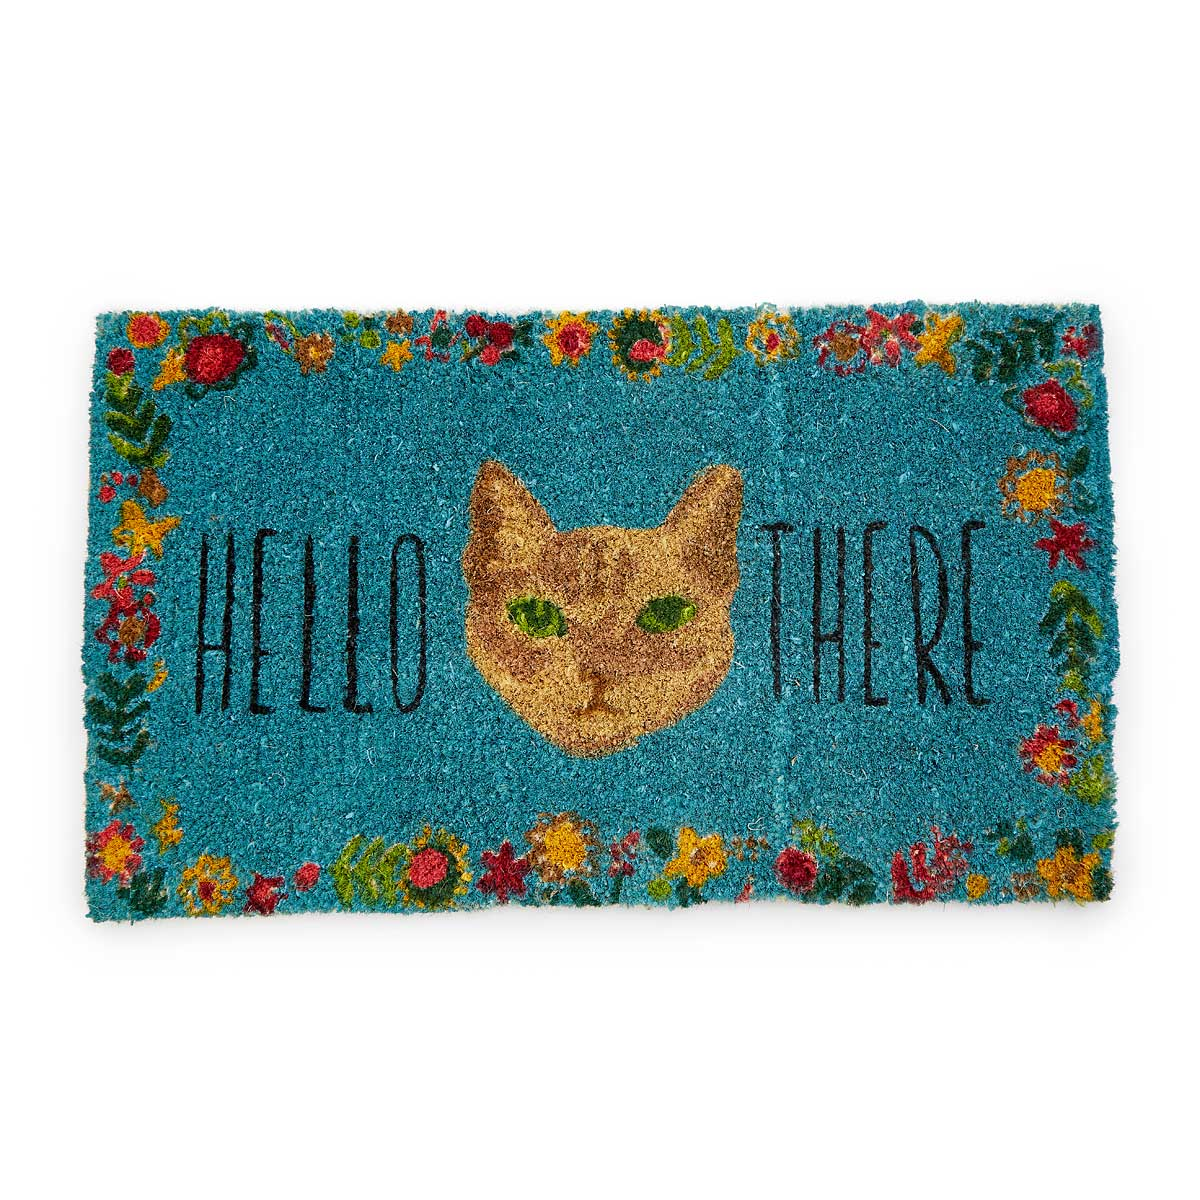 Fur and Flowers Cat Doormat 1 thumbnail  sc 1 st  UncommonGoods & Fur and Flowers Cat Doormat | Kitty Welcome Mat | UncommonGoods